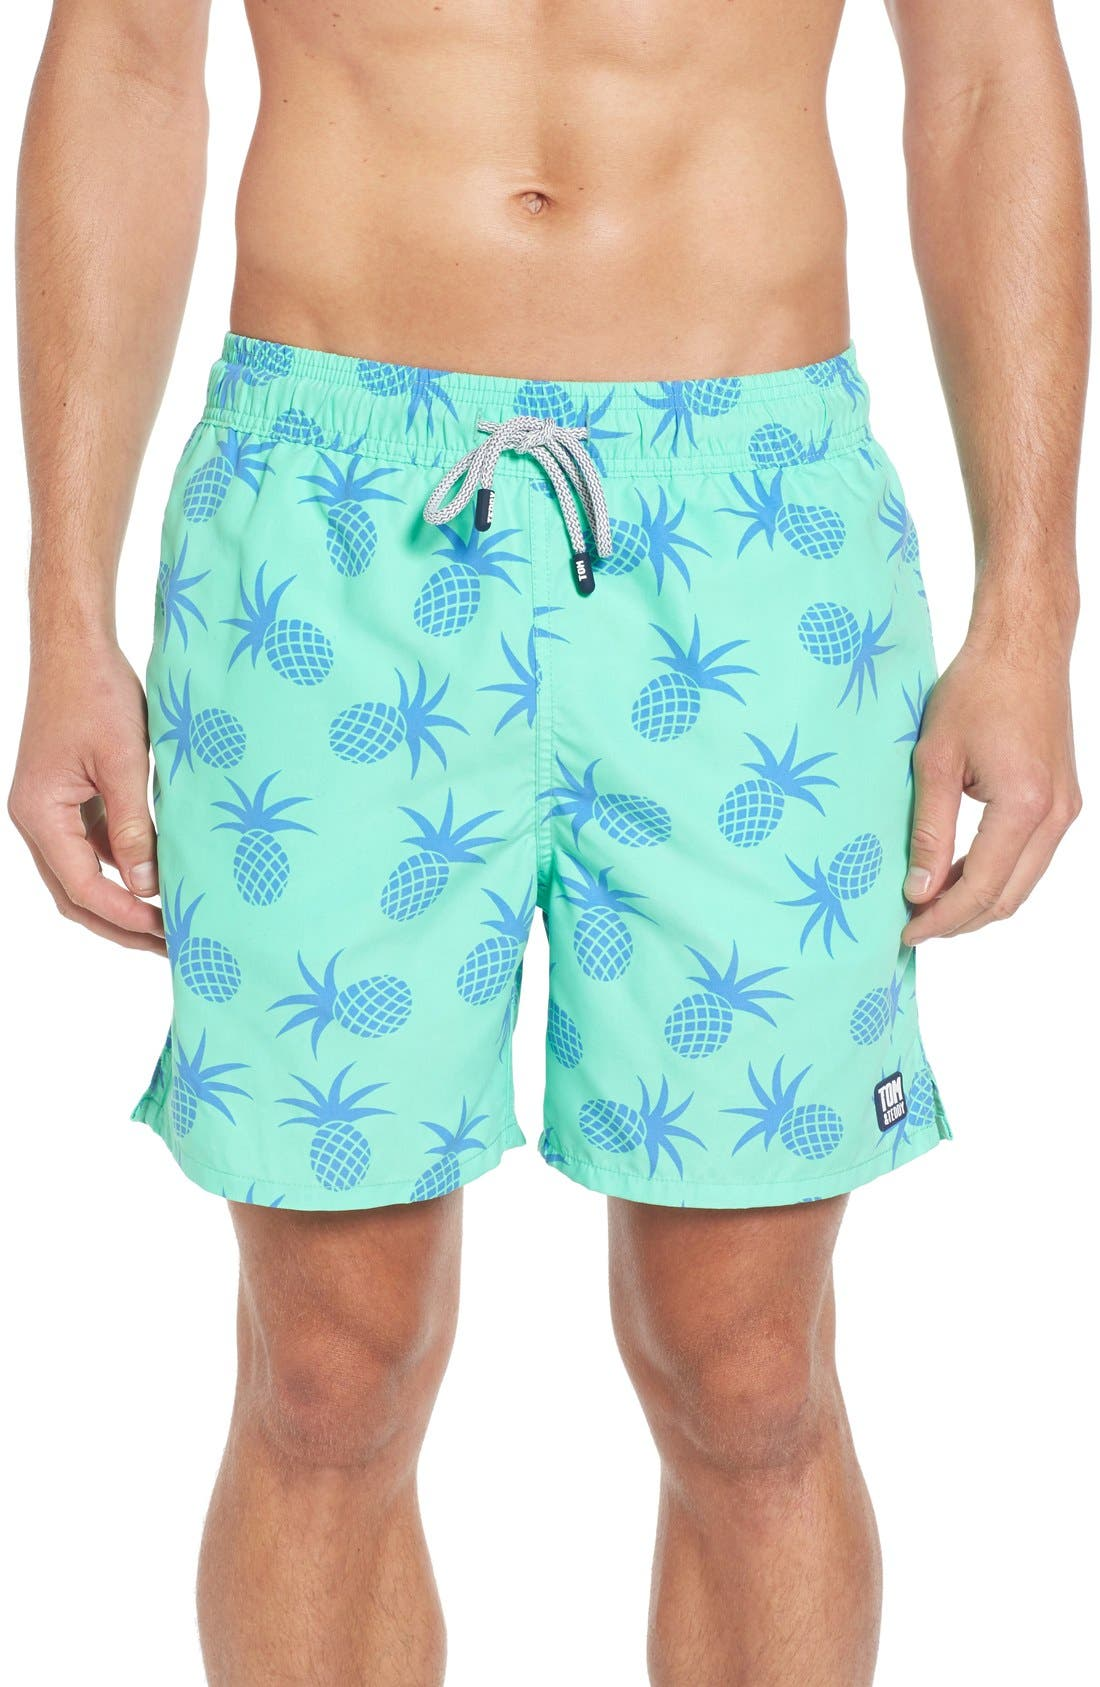 Pineapple Print Swim Trunks,                             Main thumbnail 1, color,                             Jade Green